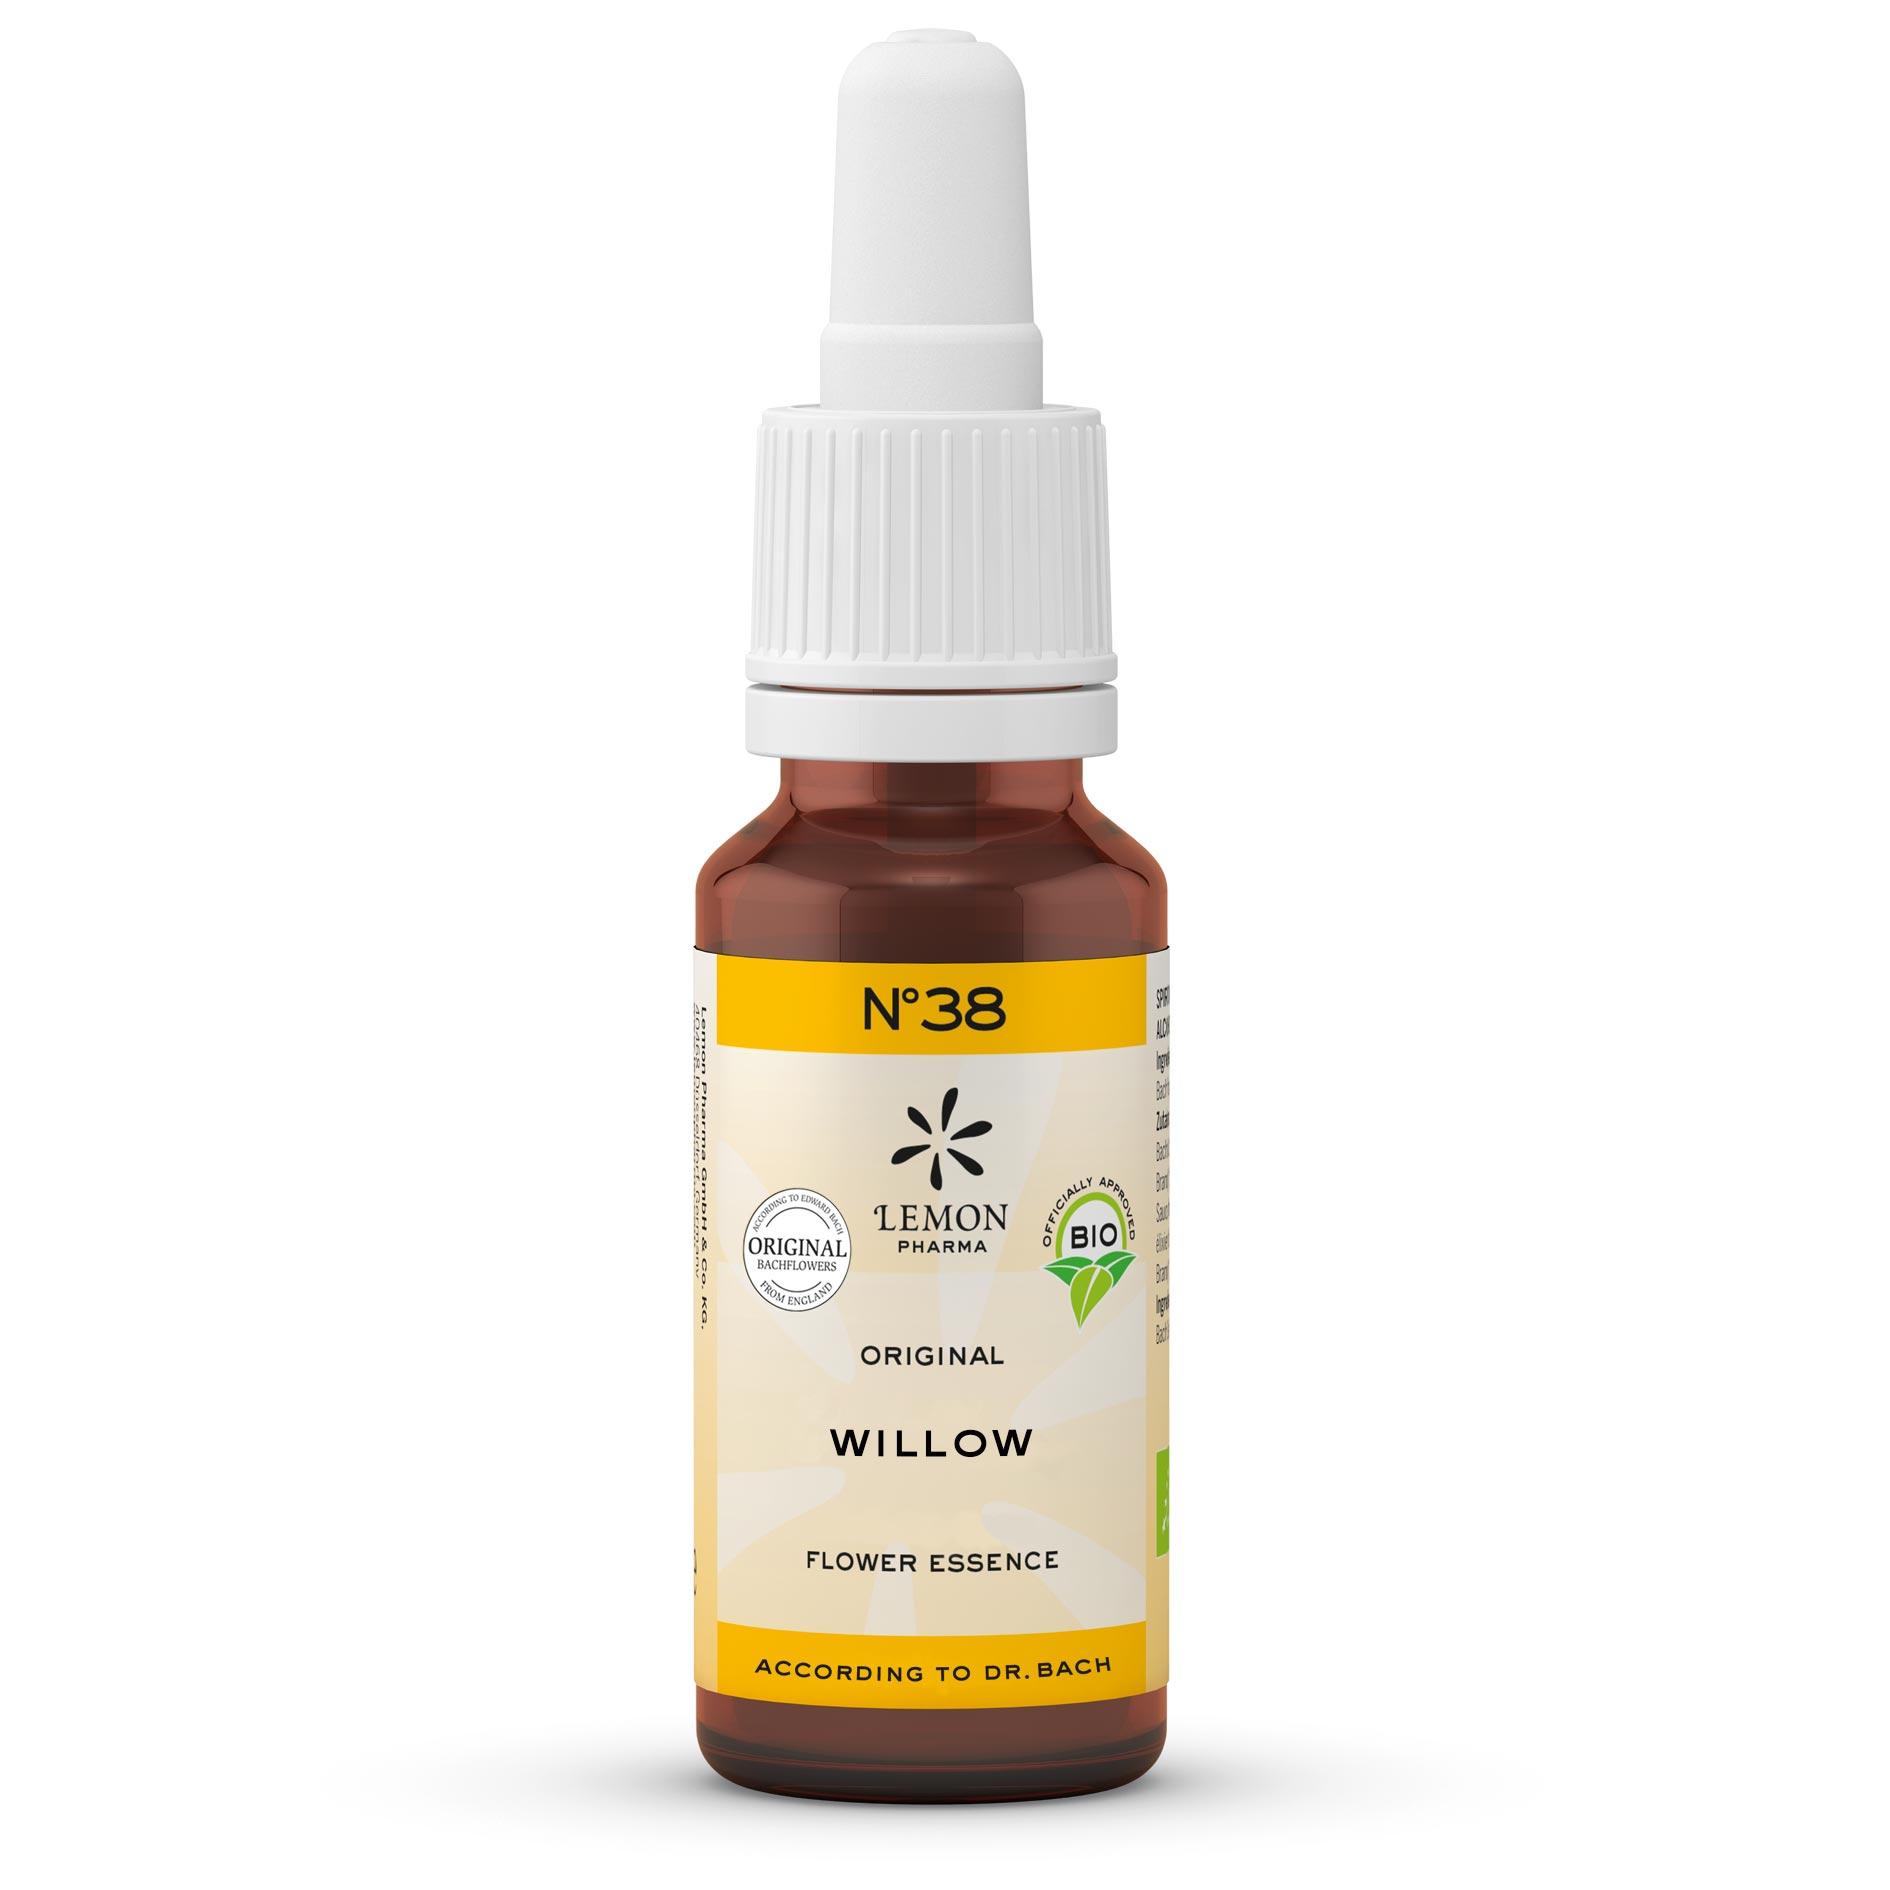 Lemon Pharma Original Bachblüten Tropfen Nr 38 Willow Weide Selbstverantwortung